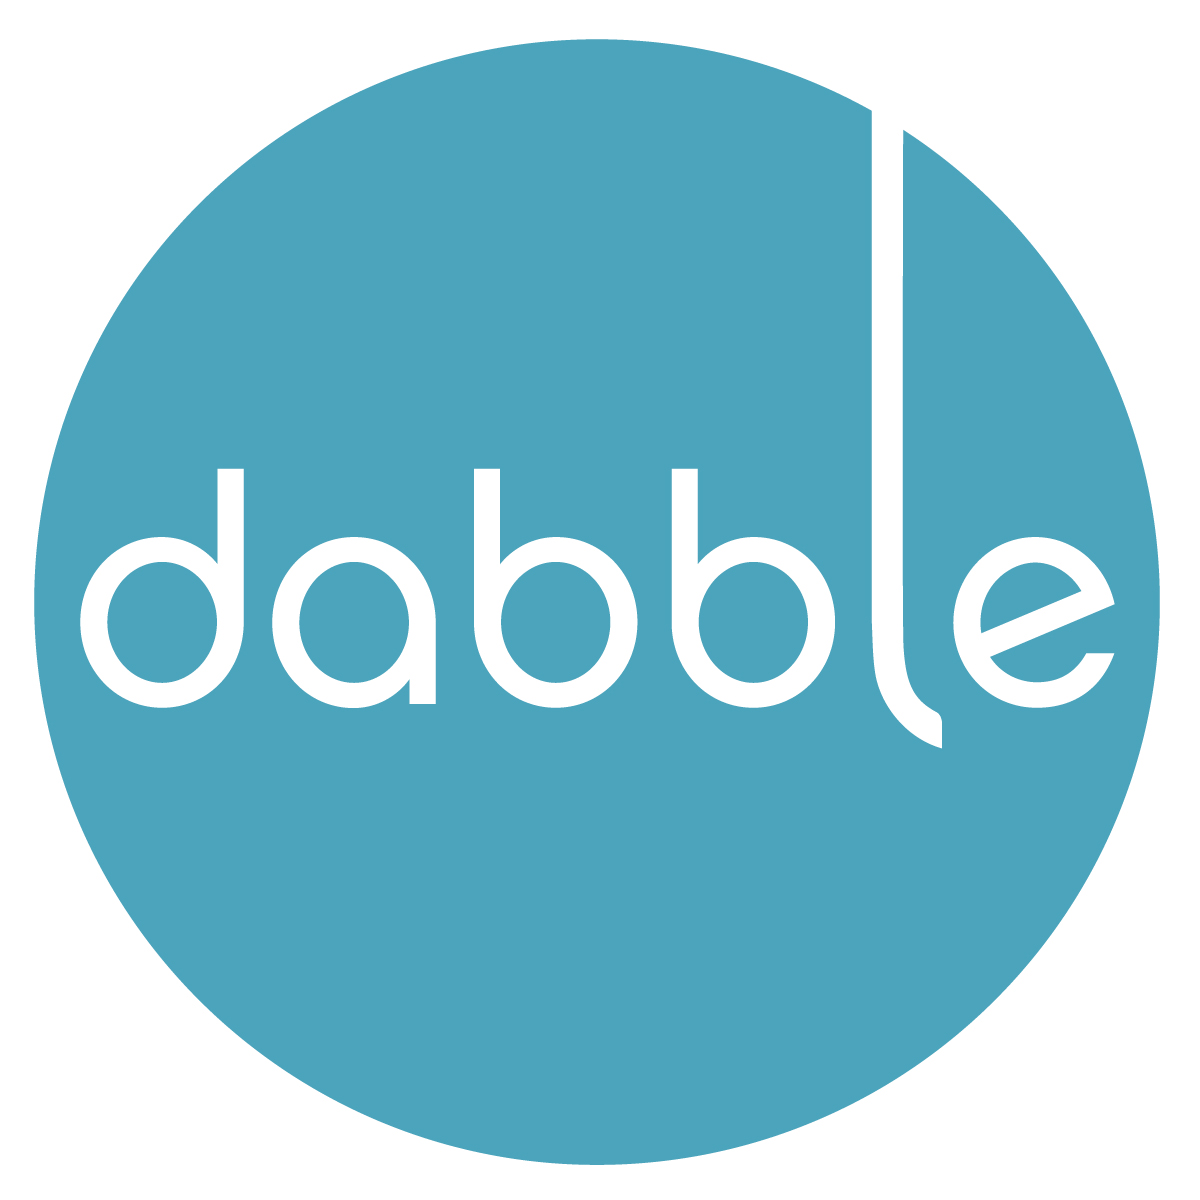 dabble_logo_large